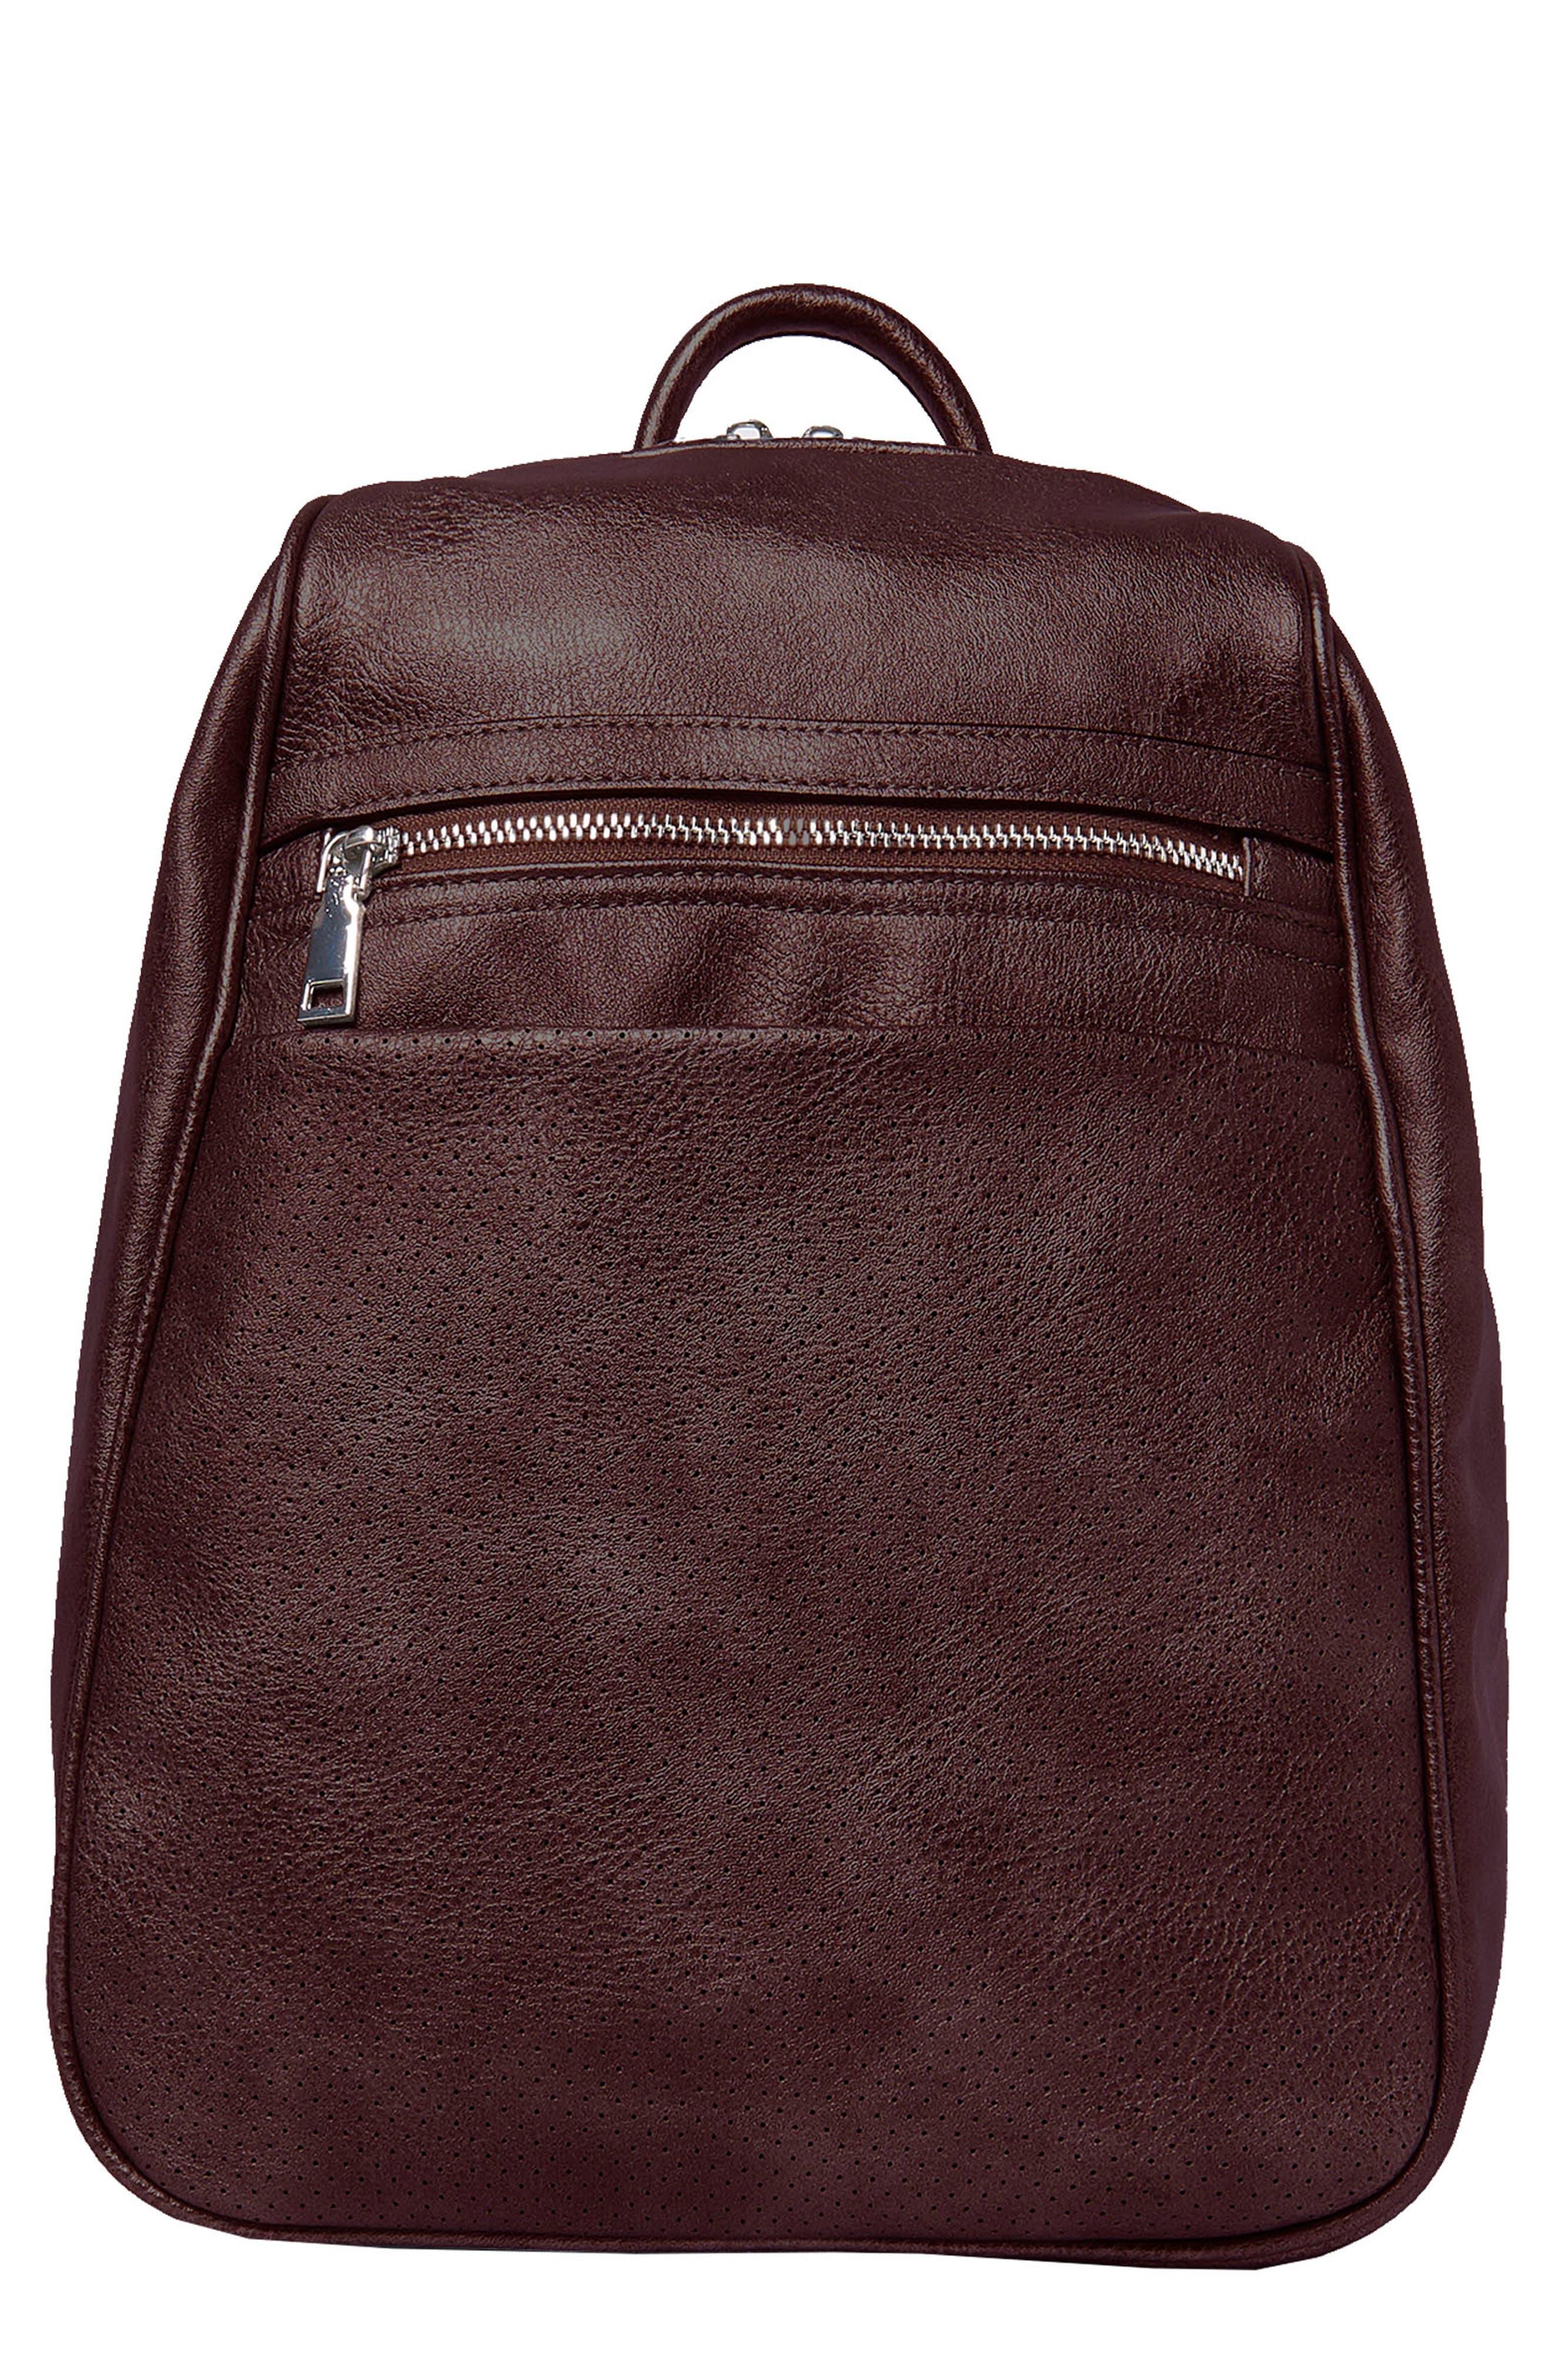 Dream On Vegan Leather Backpack - Burgundy in Berry